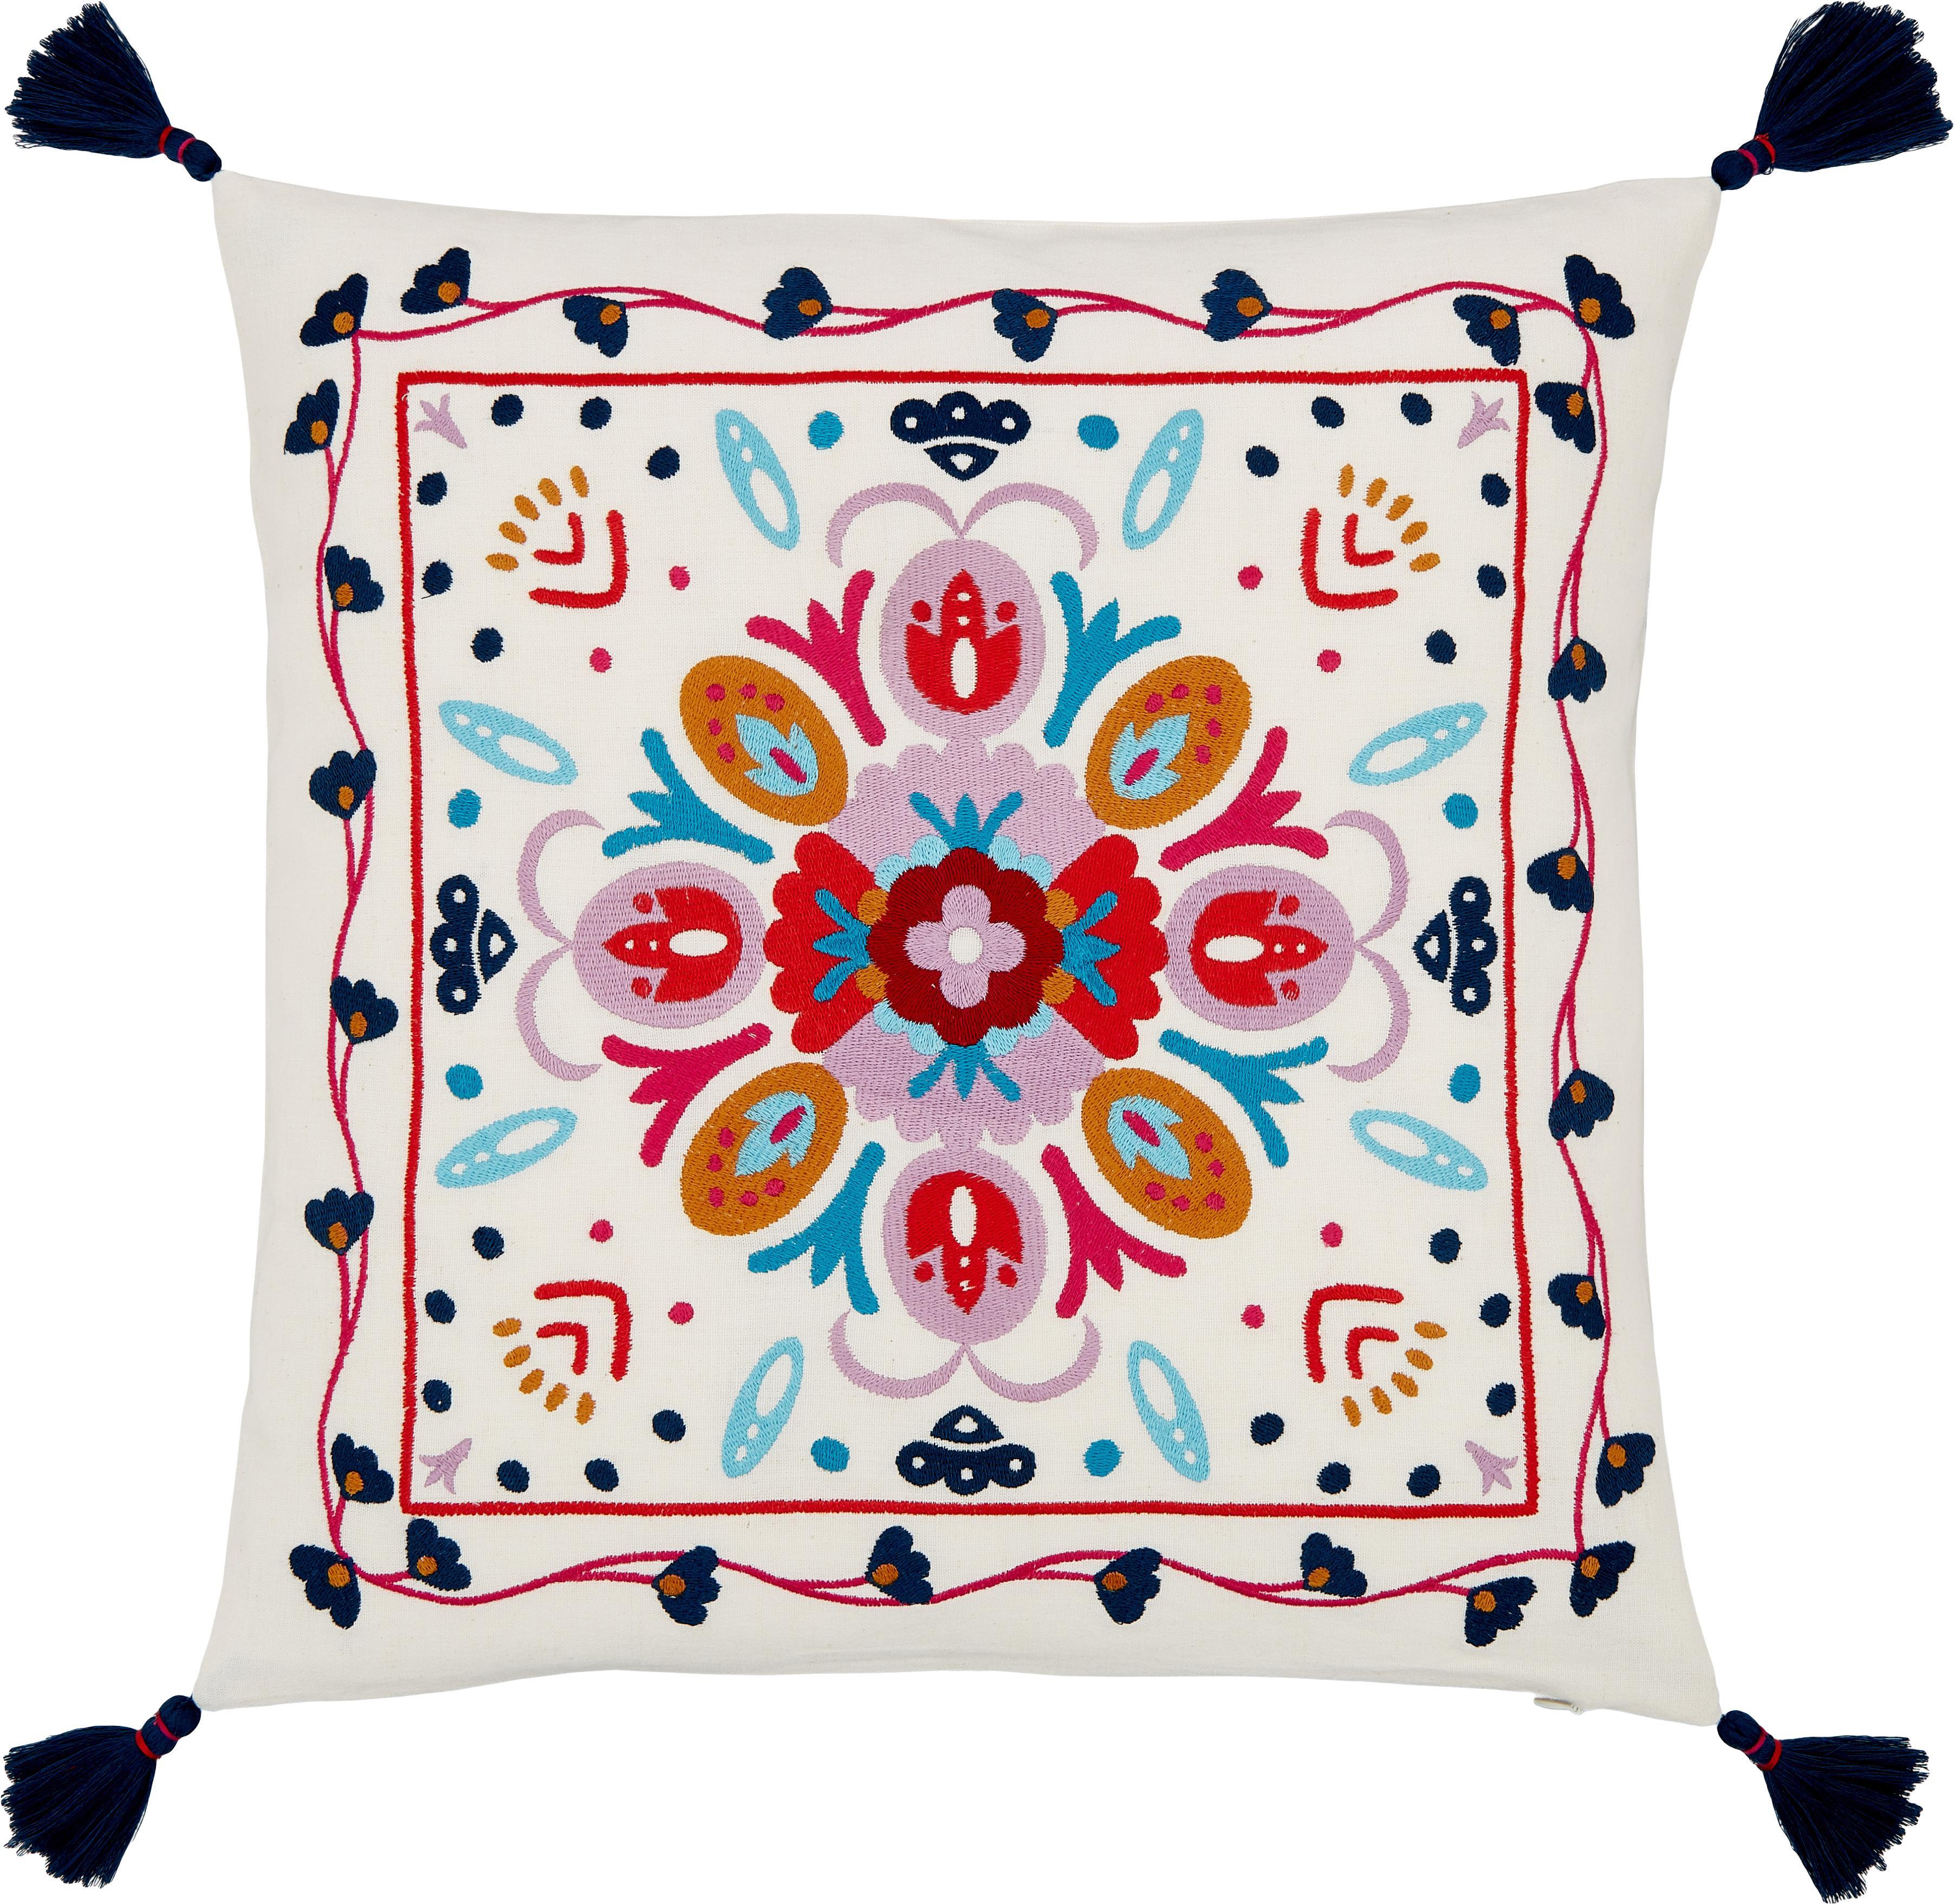 Federa arredo ricamata Flower Power, Cotone, Bianco crema, multicolore, Larg. 45 x Lung. 45 cm